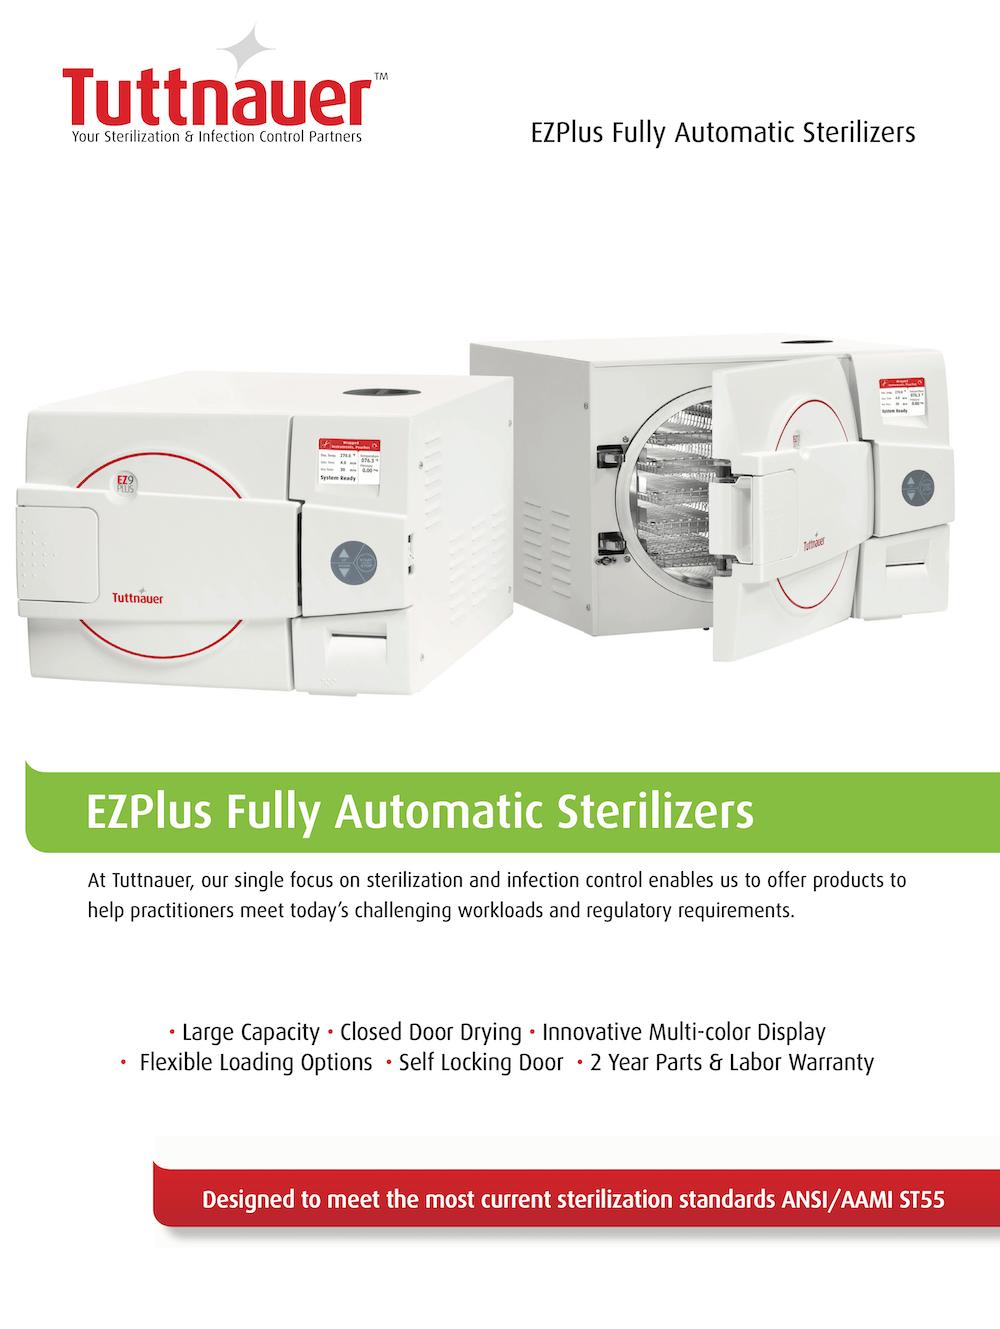 Tuttnauer-EZPlus-Fully-Automatic-Sterilizers